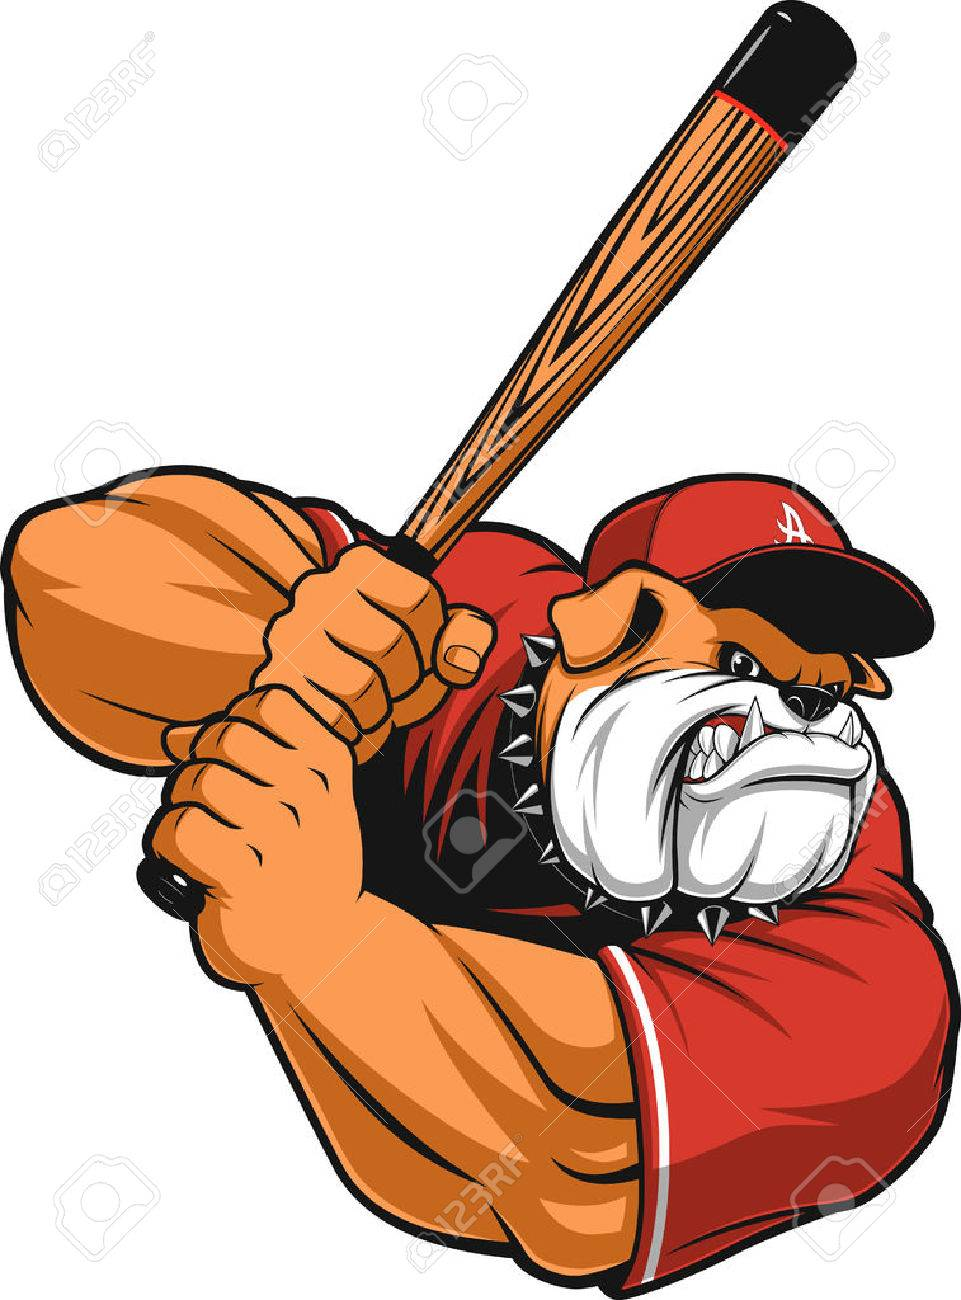 illustration ferocious Bulldog baseball player hits a ball - 56479990